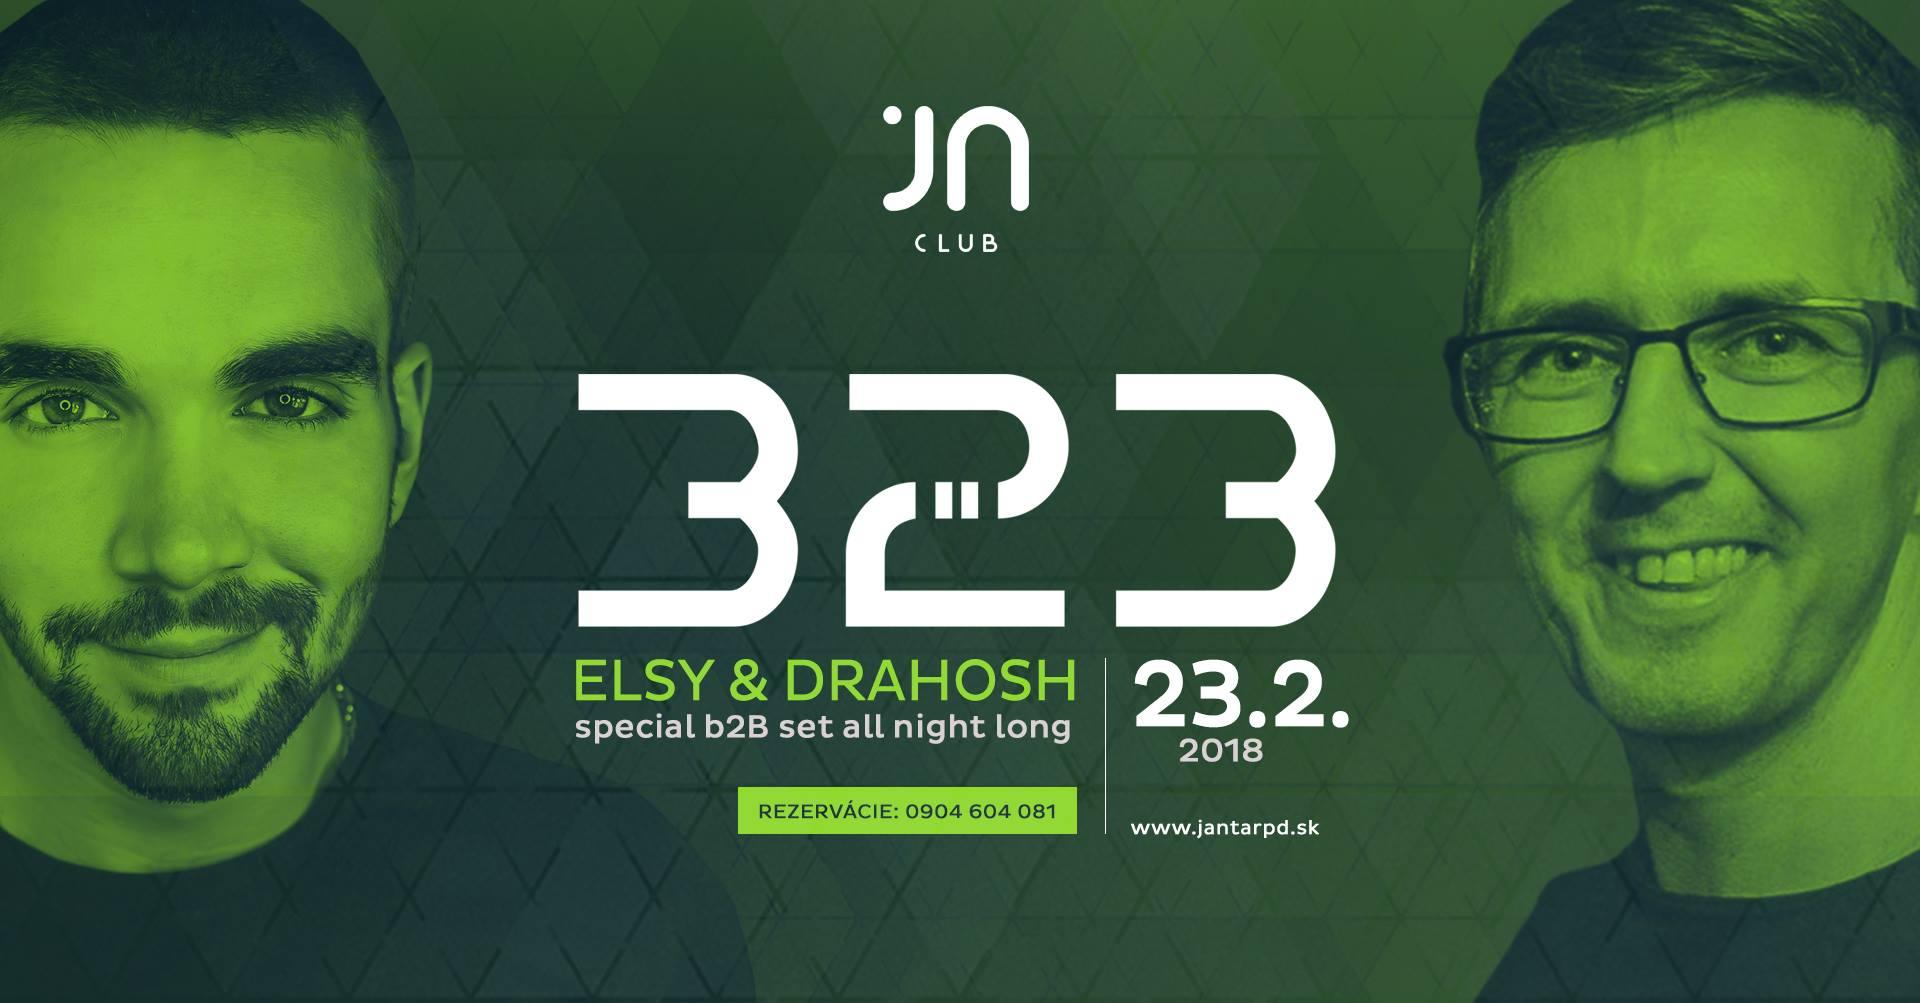 B2B Elsy & Drahosh at Jantár Club